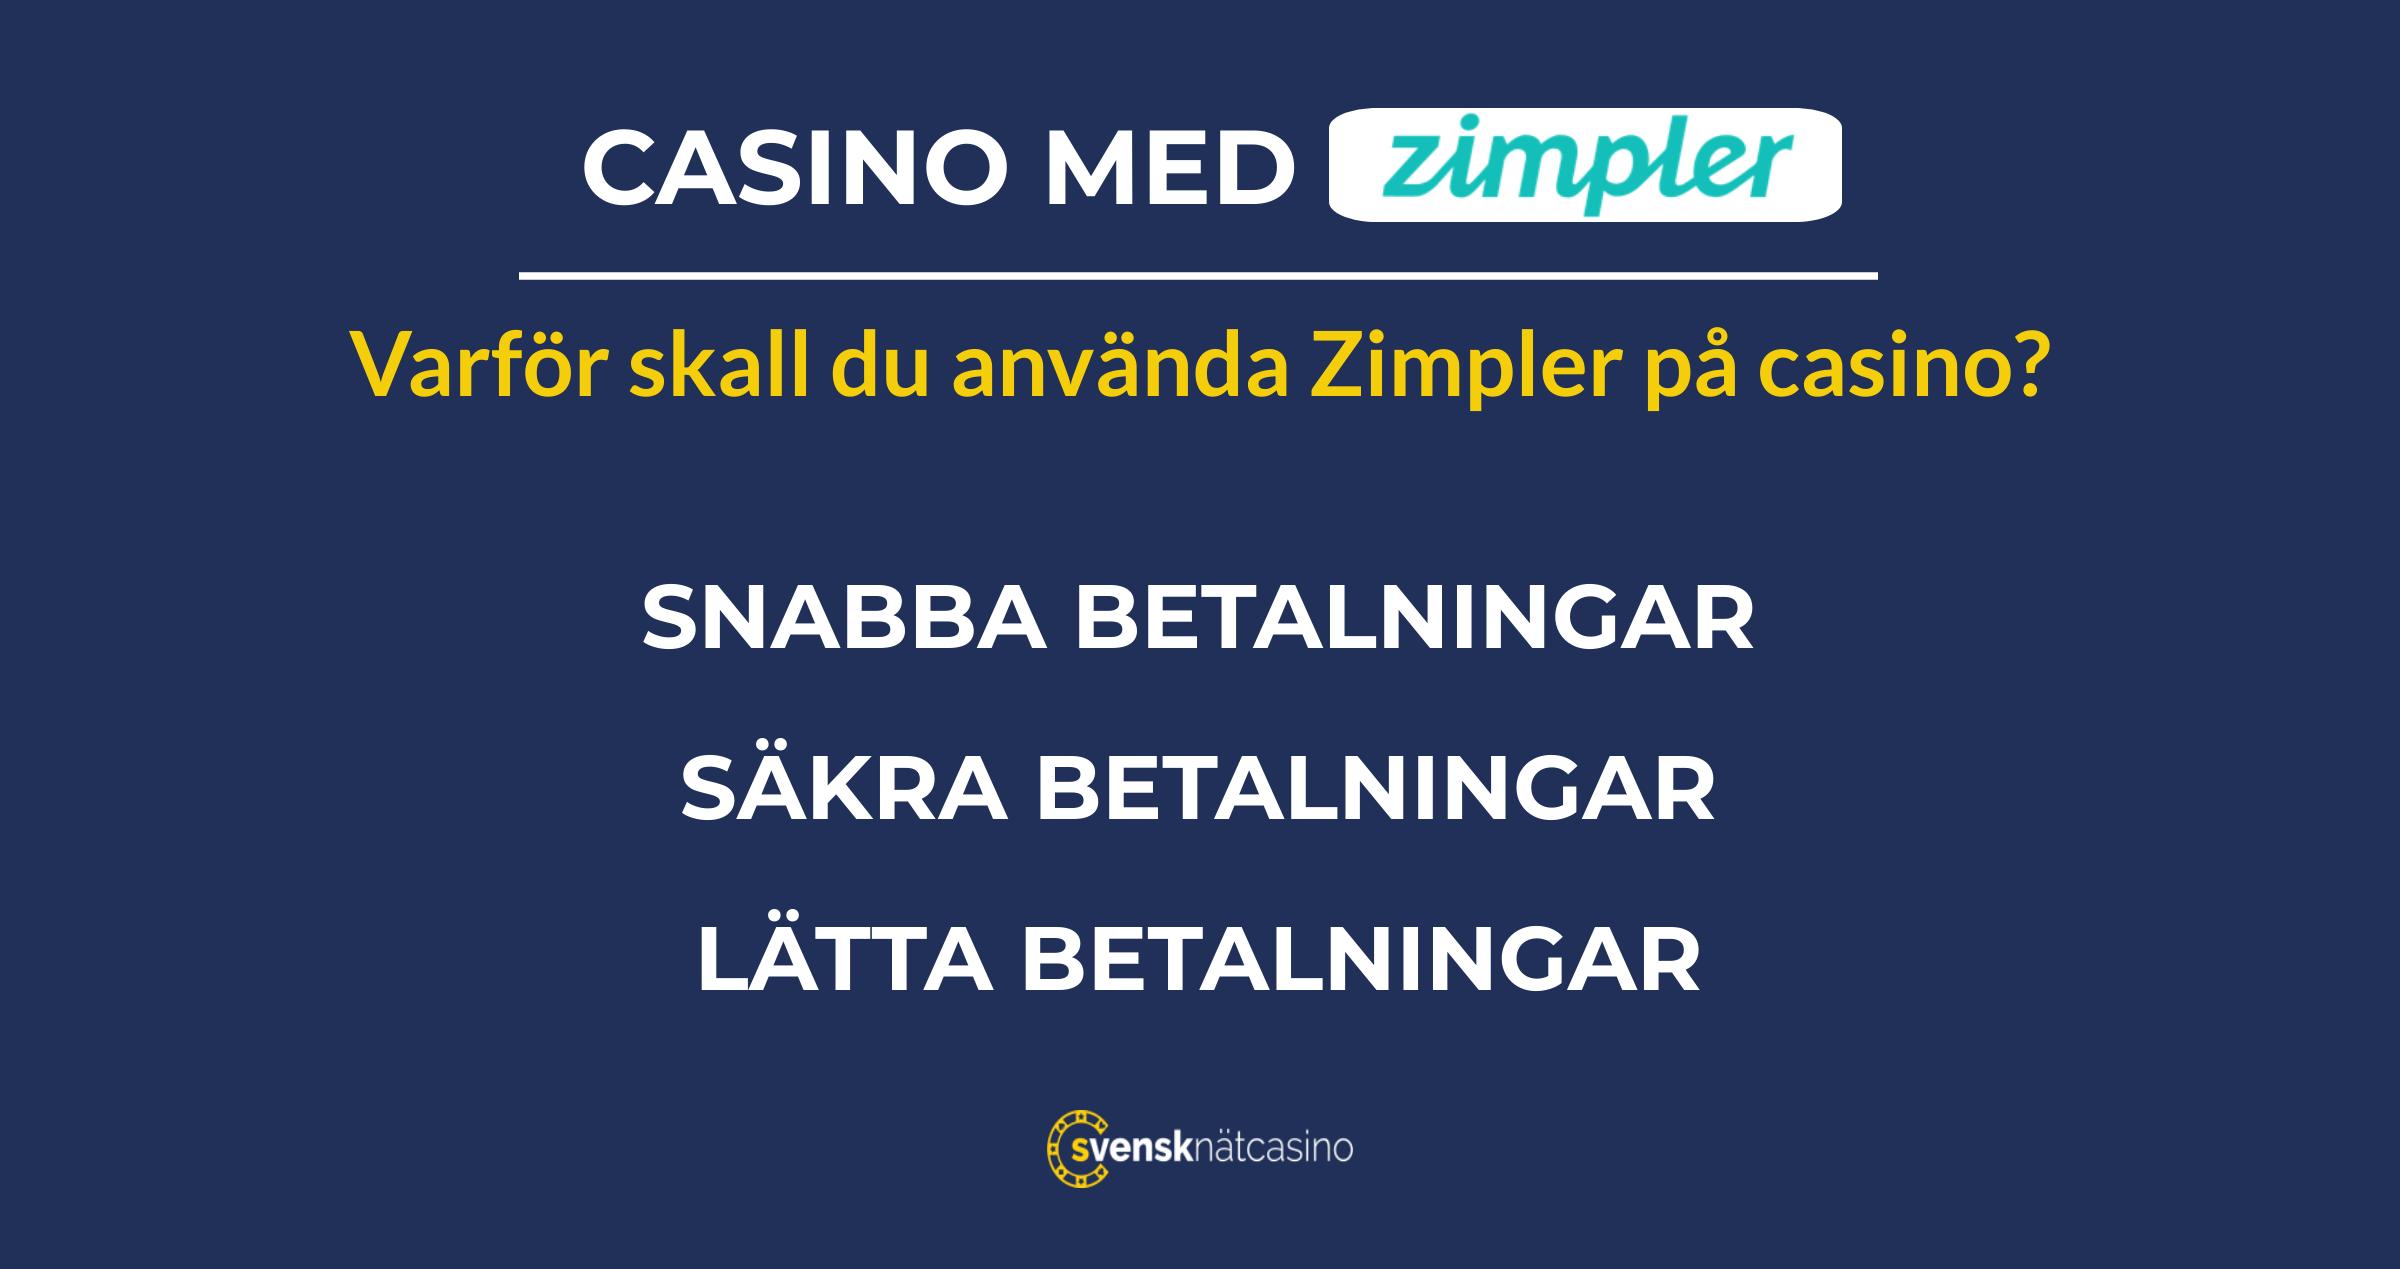 casino med zimpler swish fordelar svensknatcasino se